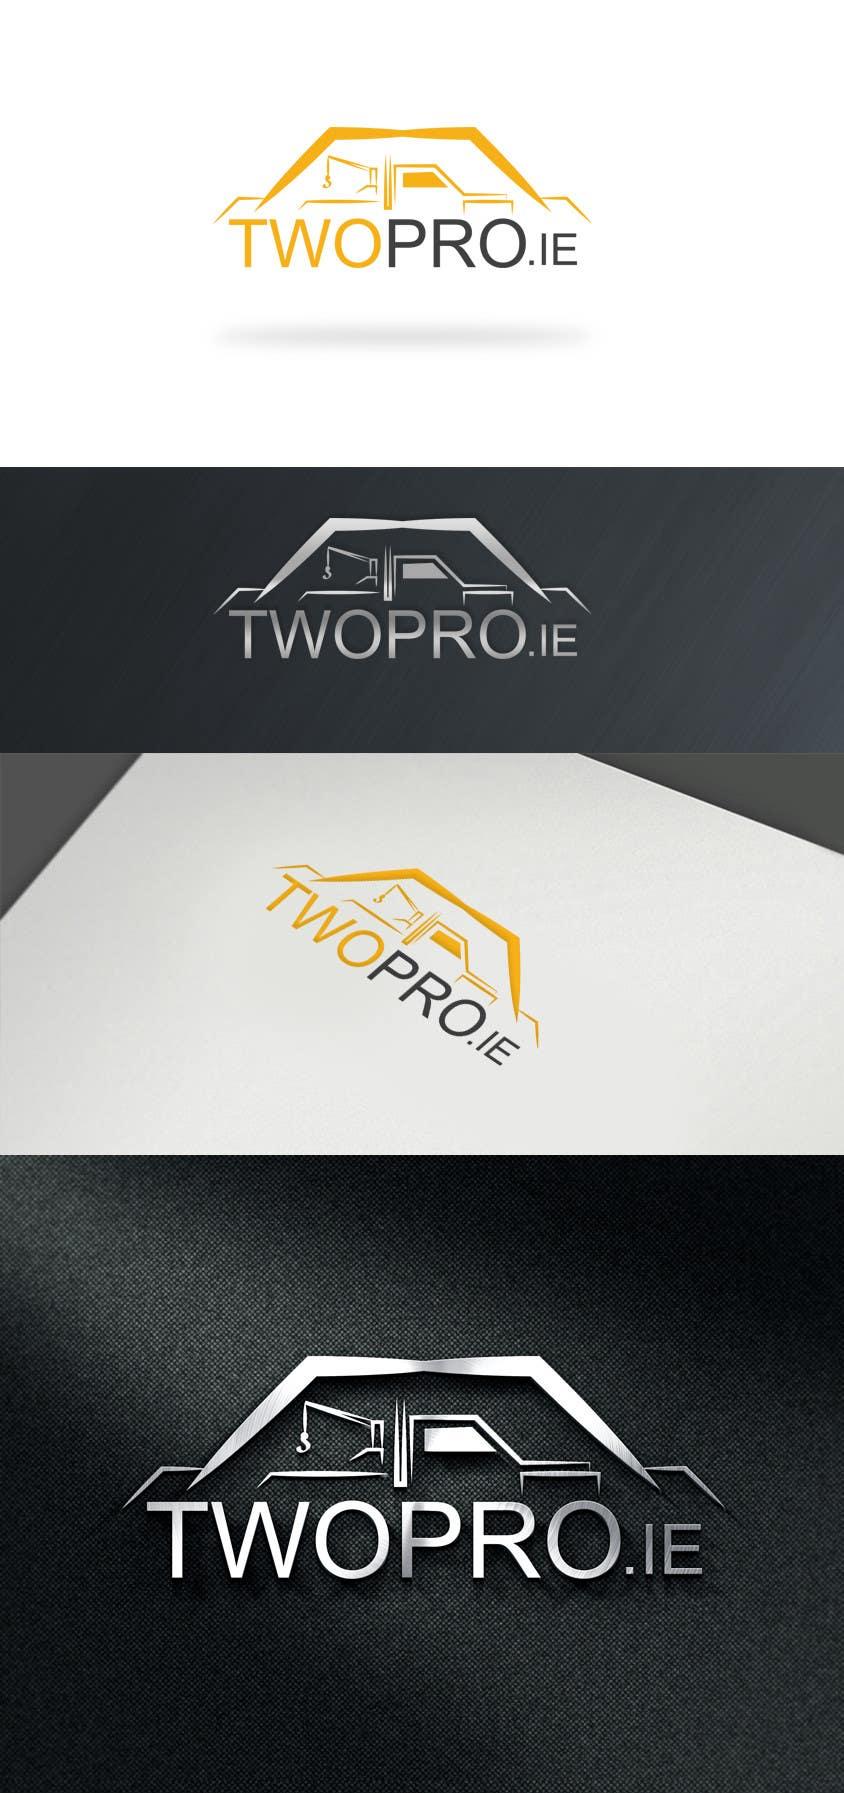 Penyertaan Peraduan #80 untuk Design a Logo for Towing company